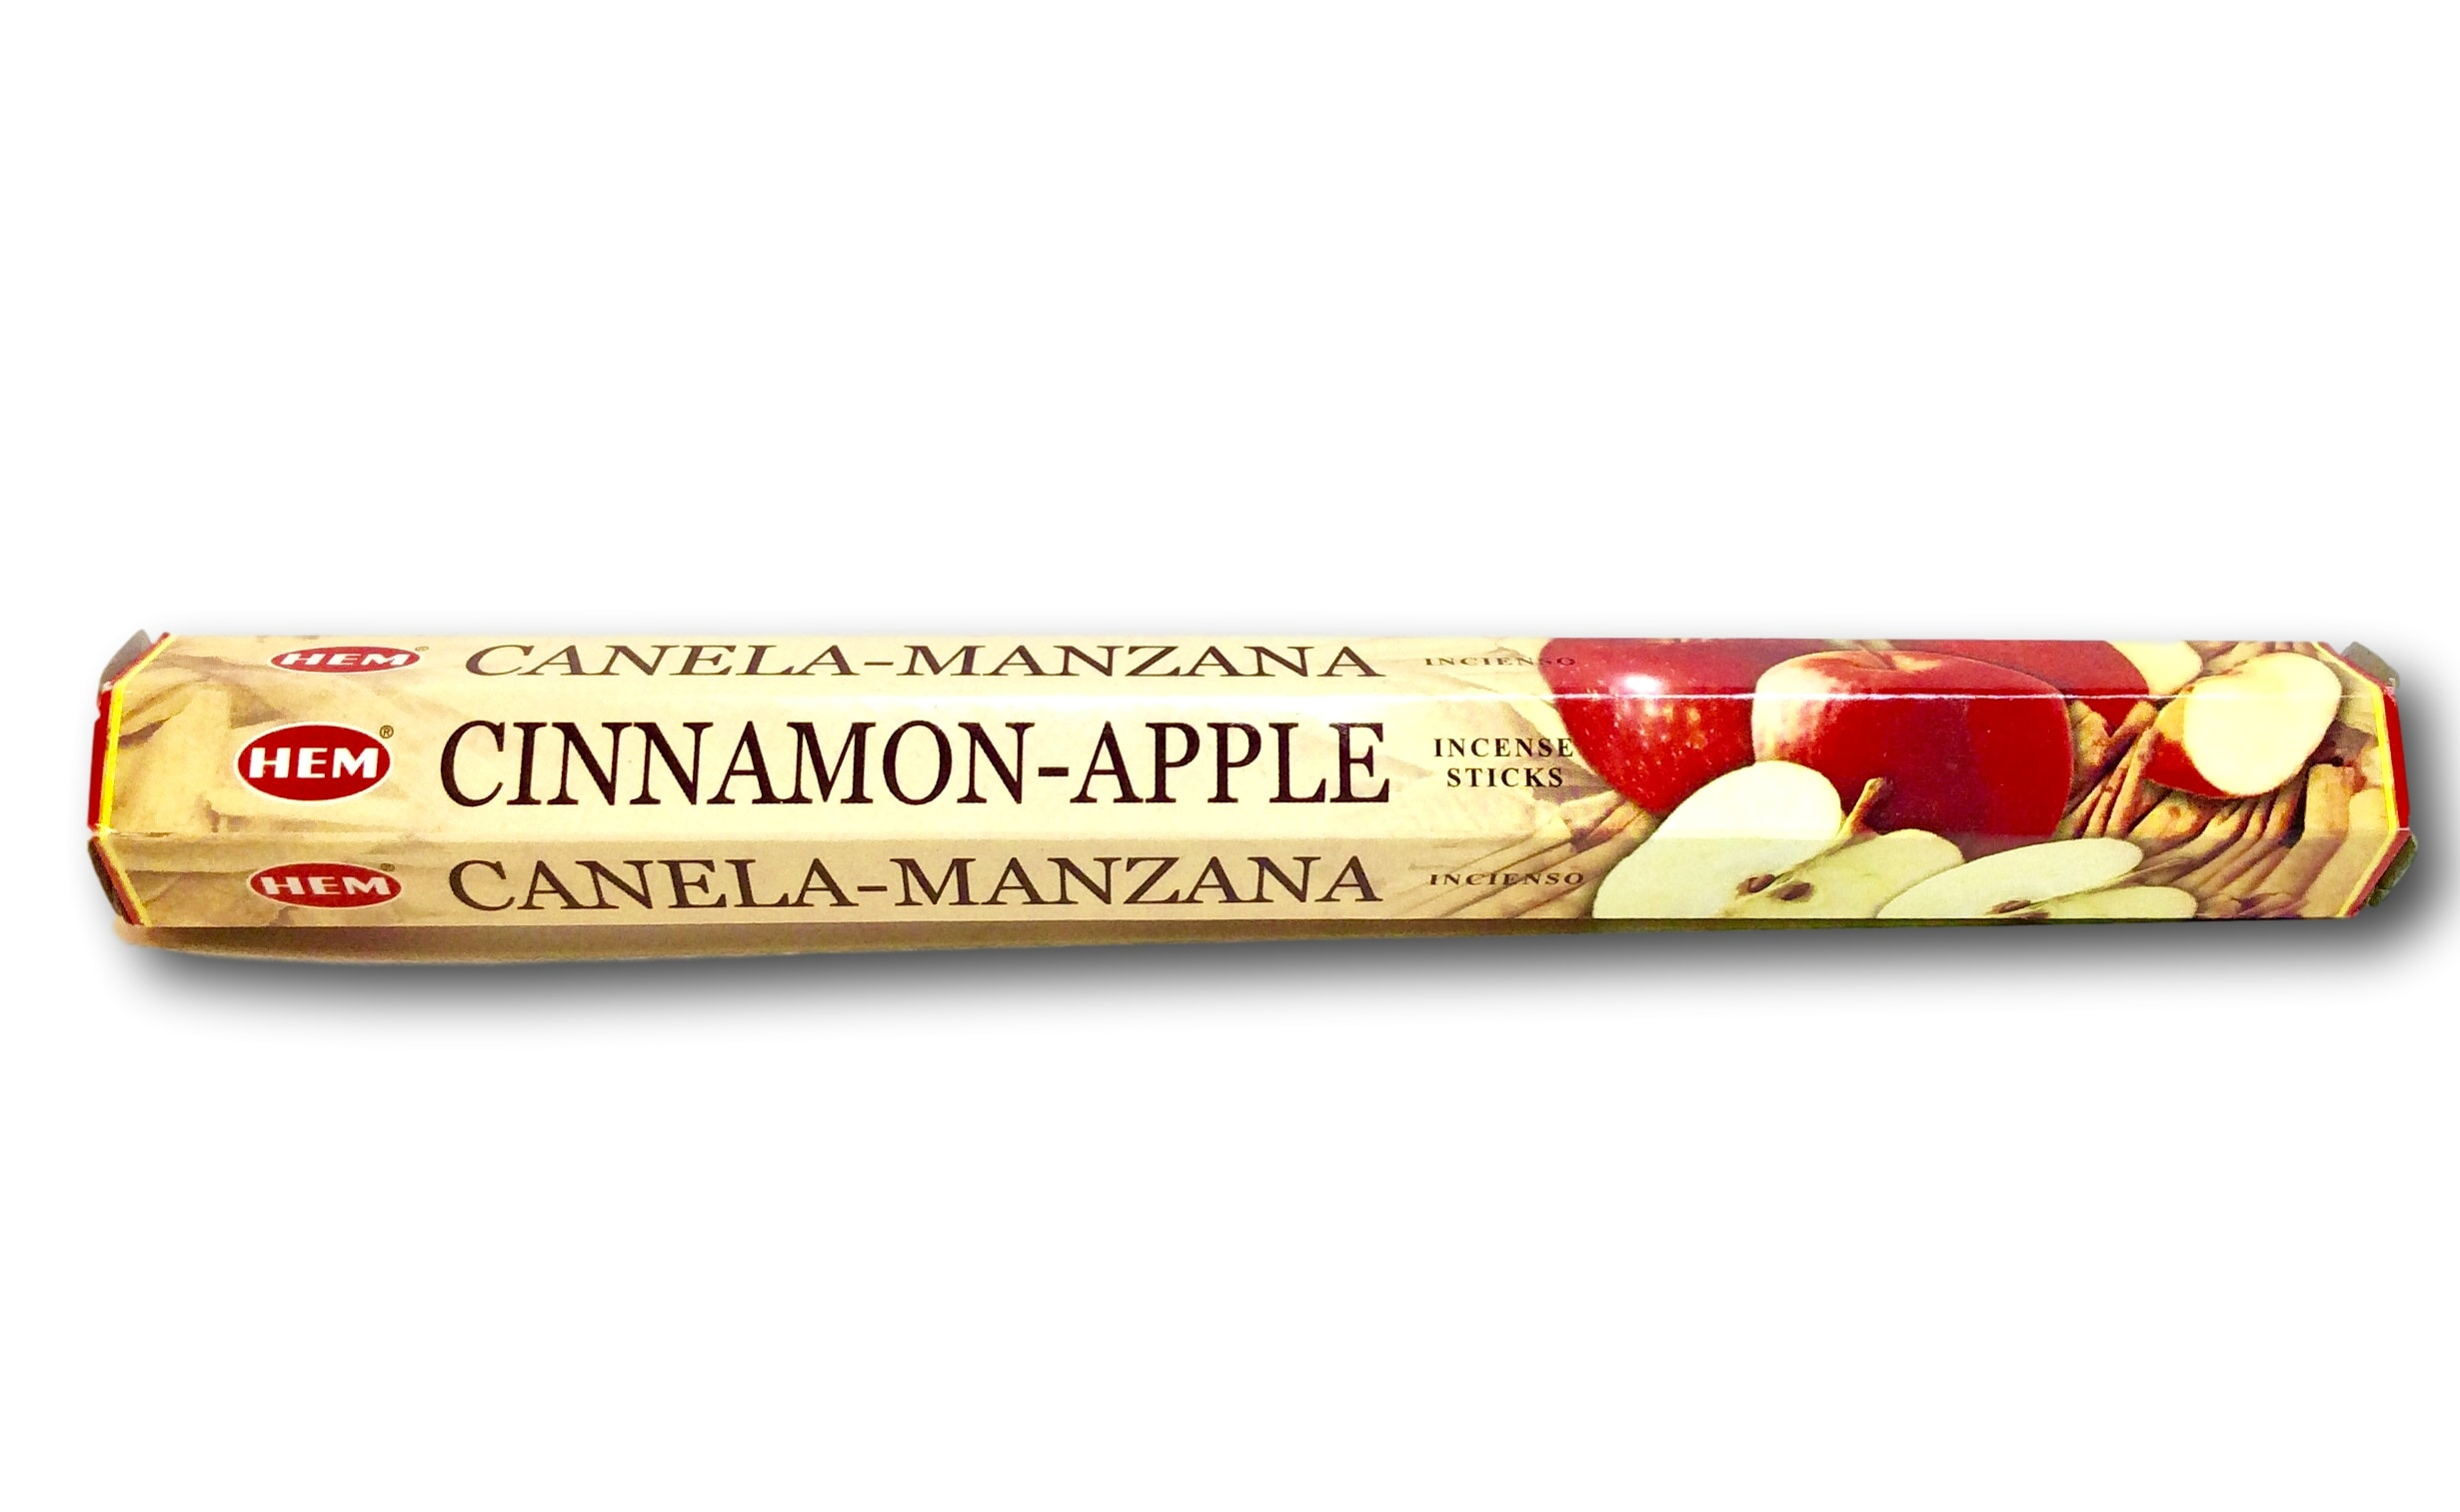 Cinnamon Apple Incense